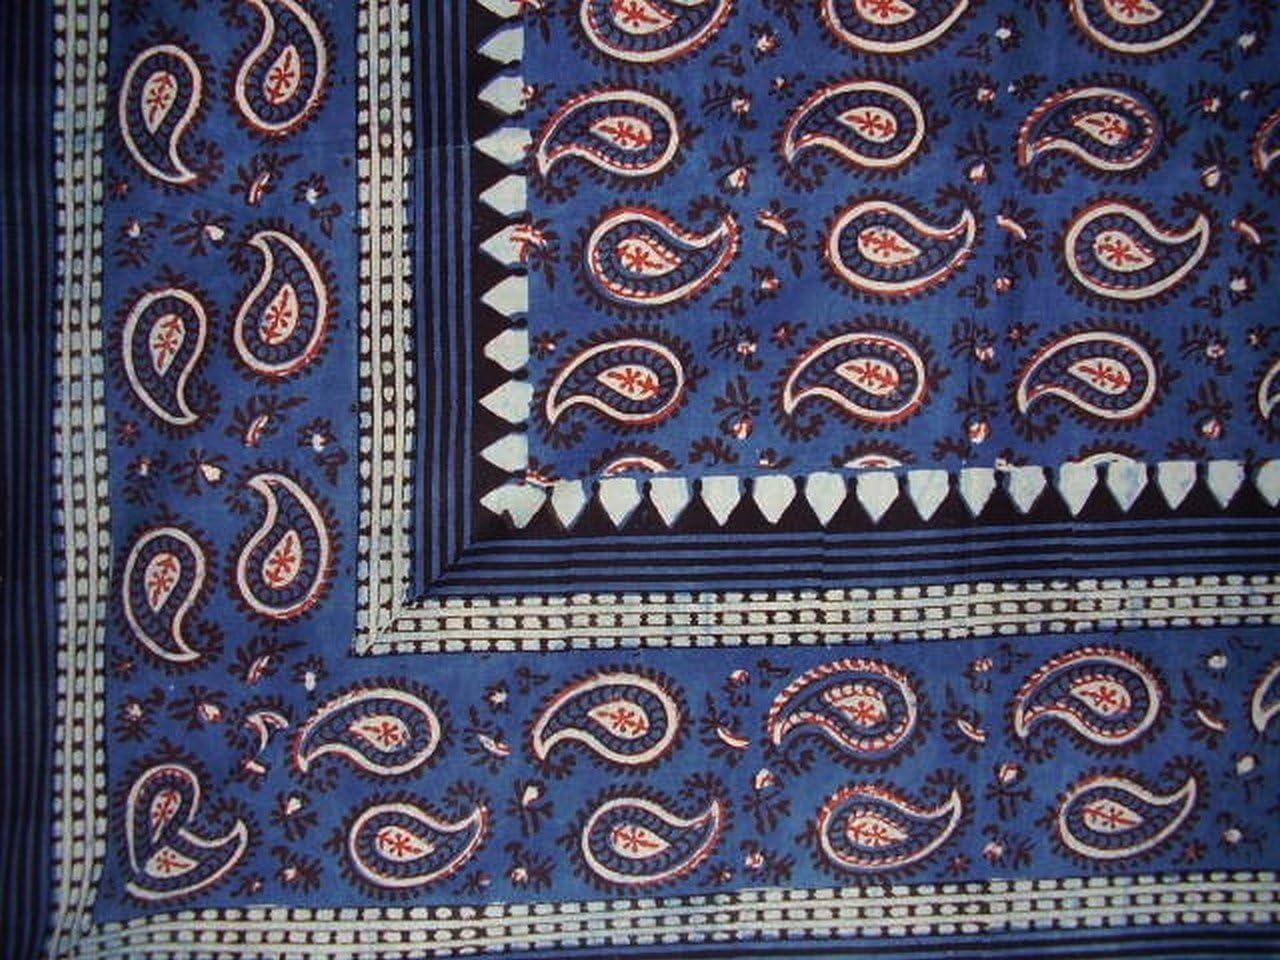 Homestead Primitive Paisley Block Print Tapestry Cotton Spread 106 x 70 Twin Blue